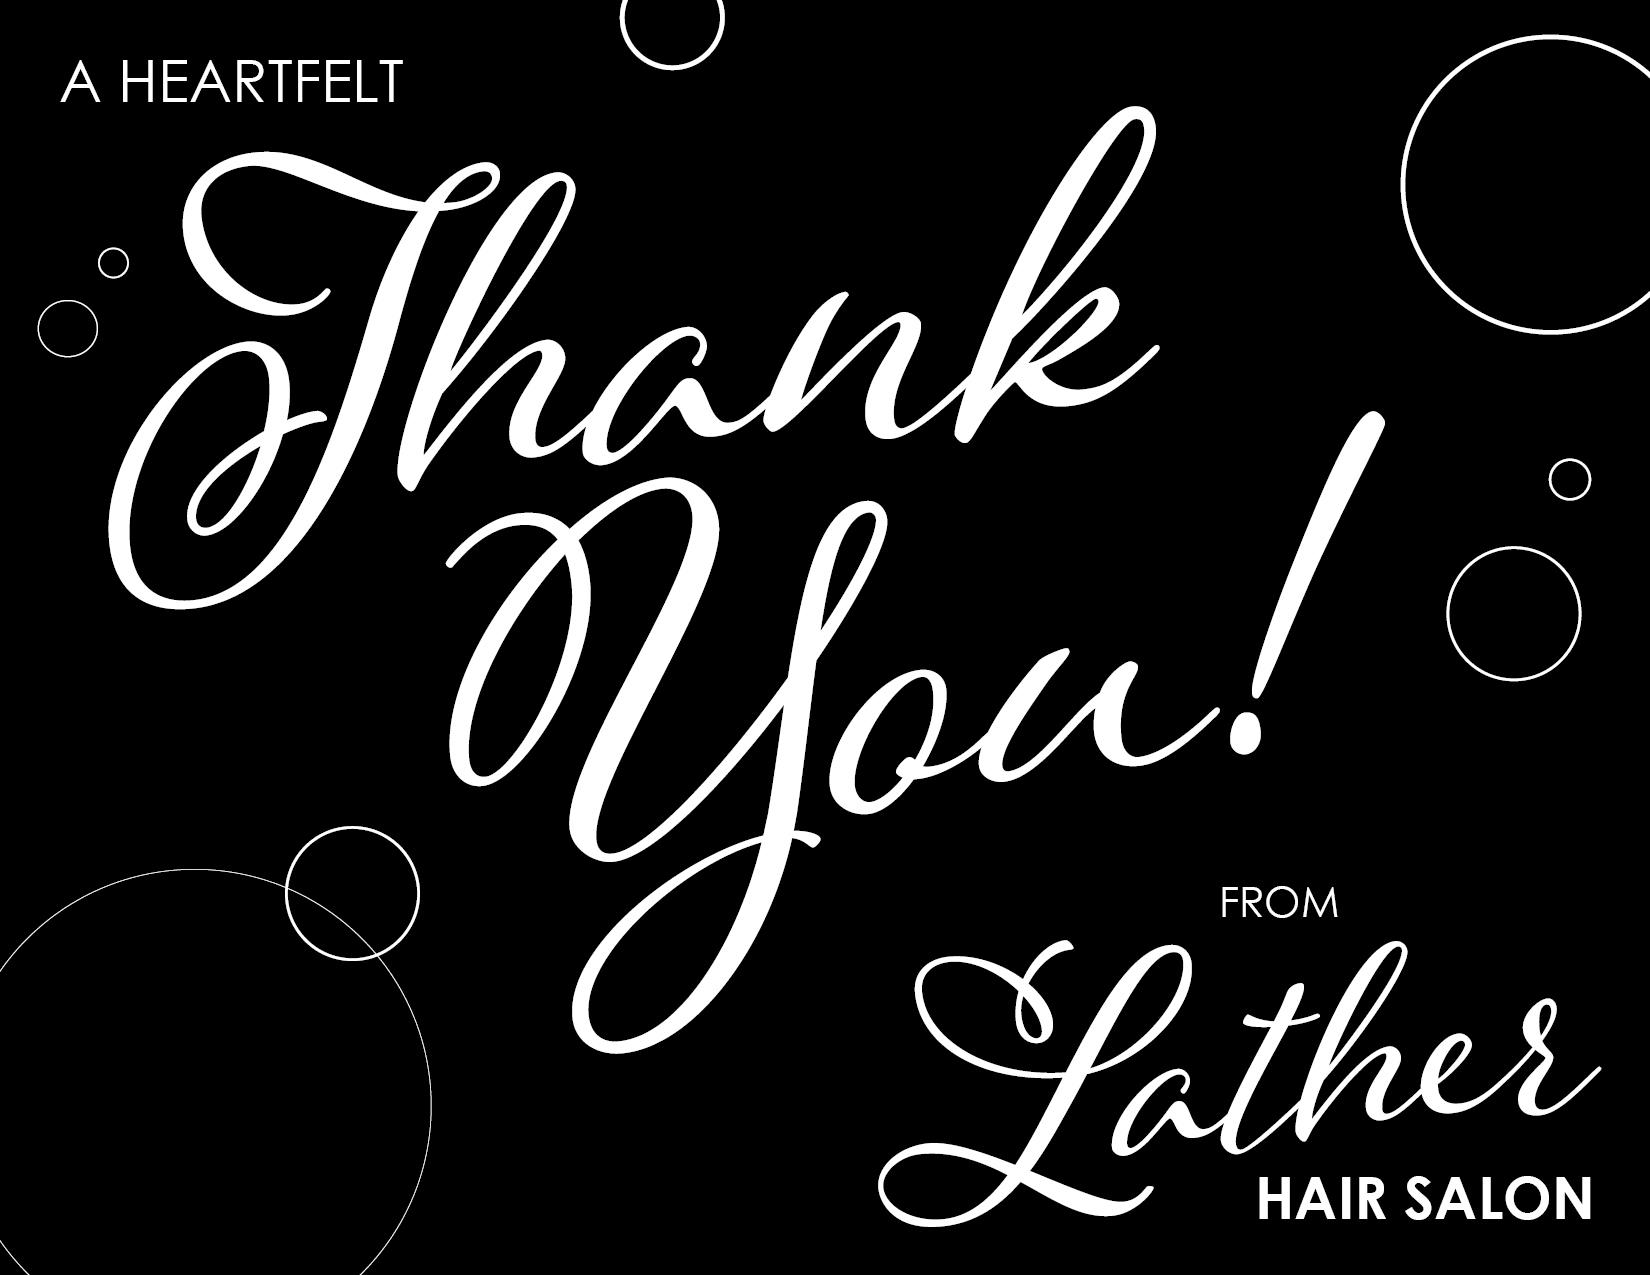 Postcard - Thank You Lather Hair Salon 2019.jpg